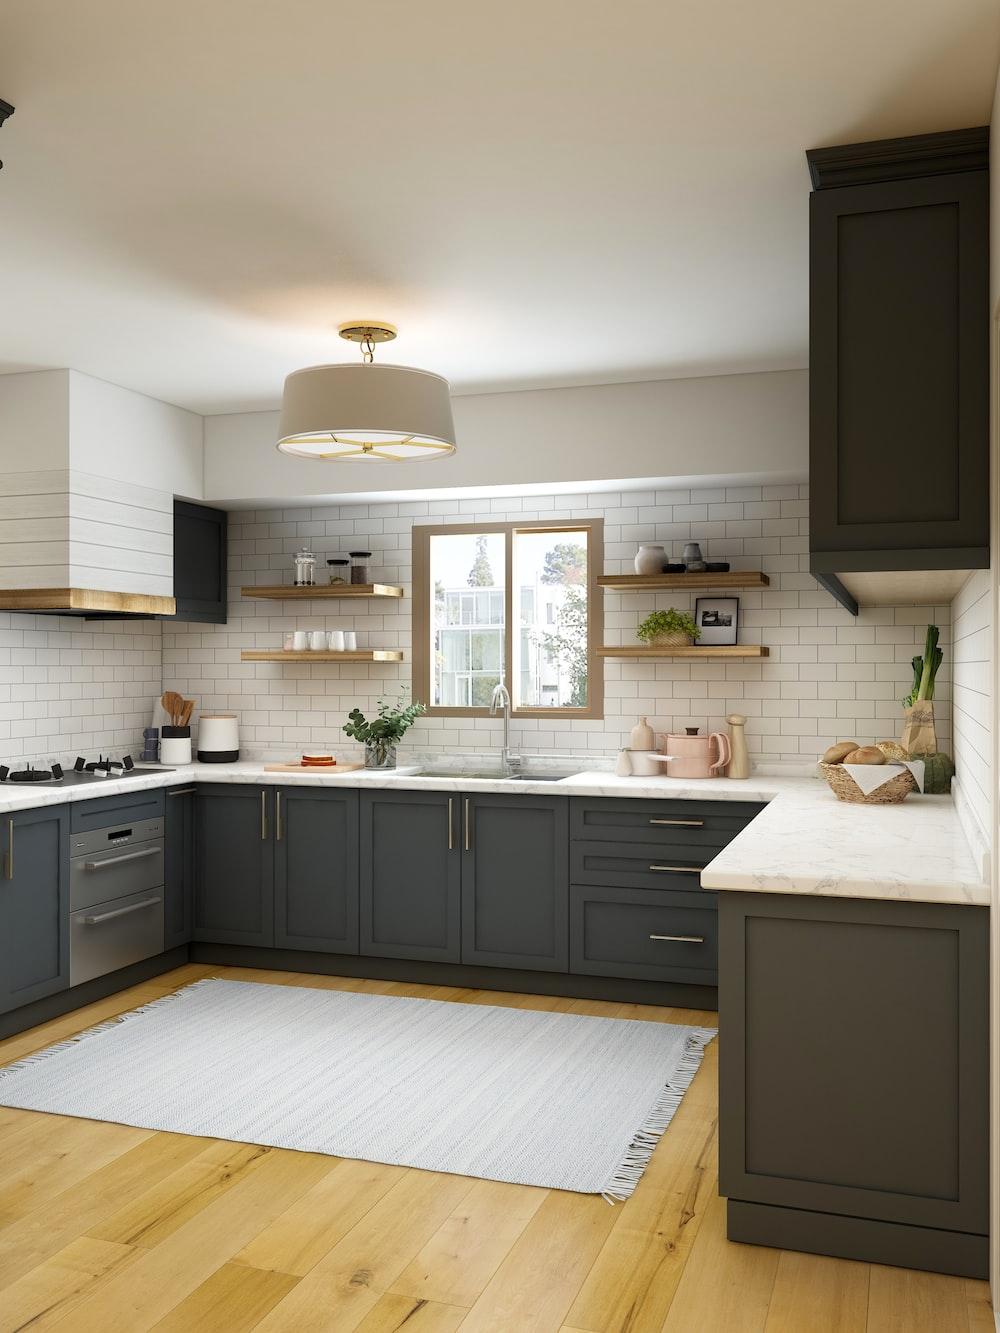 9+ Kitchen Design Pictures   Download Free Images on Unsplash